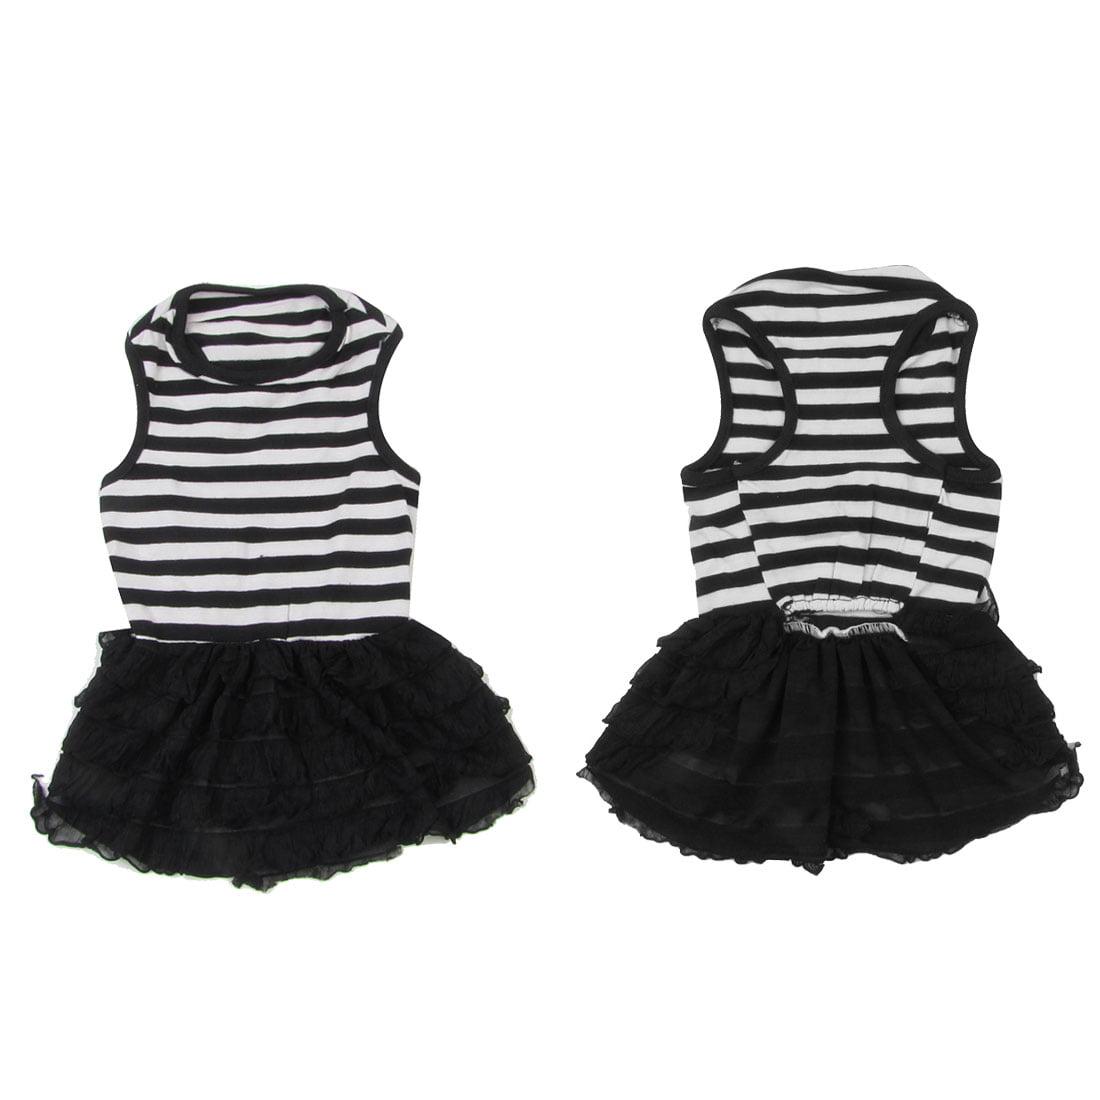 Unique Bargains Lace Decor Stripe Printed Pet Chihuahua Dress Apparel Clothing Black White M